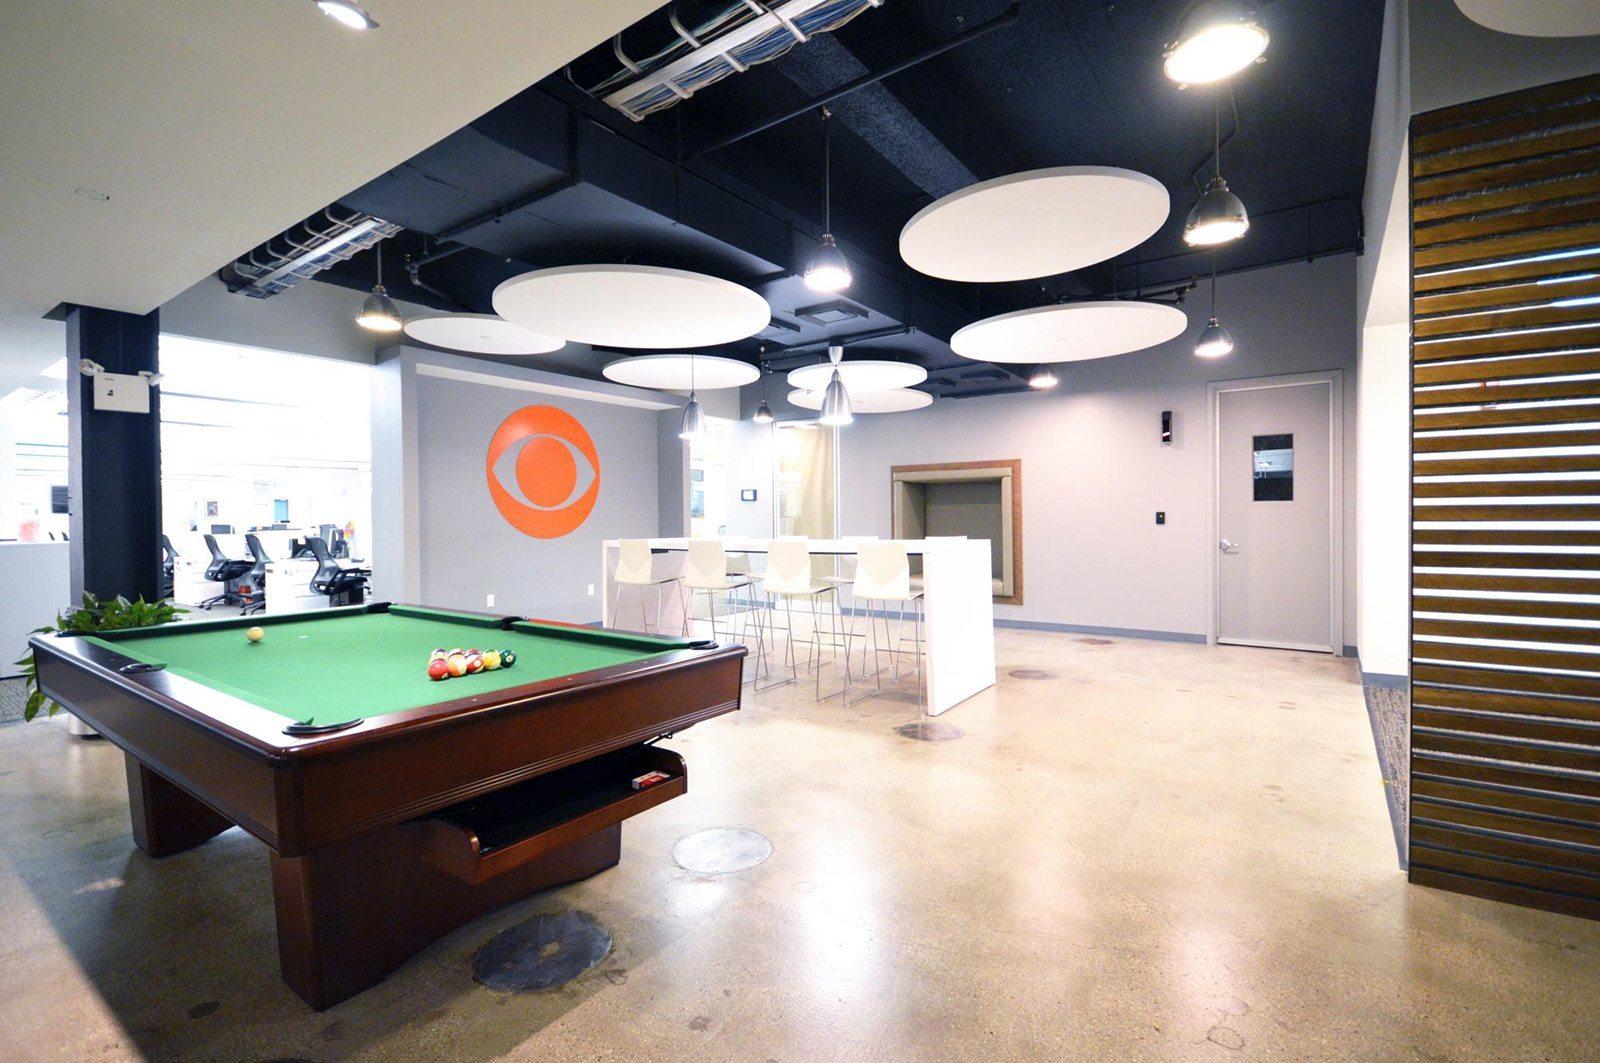 A Look Inside CBS Interactives New York City Office